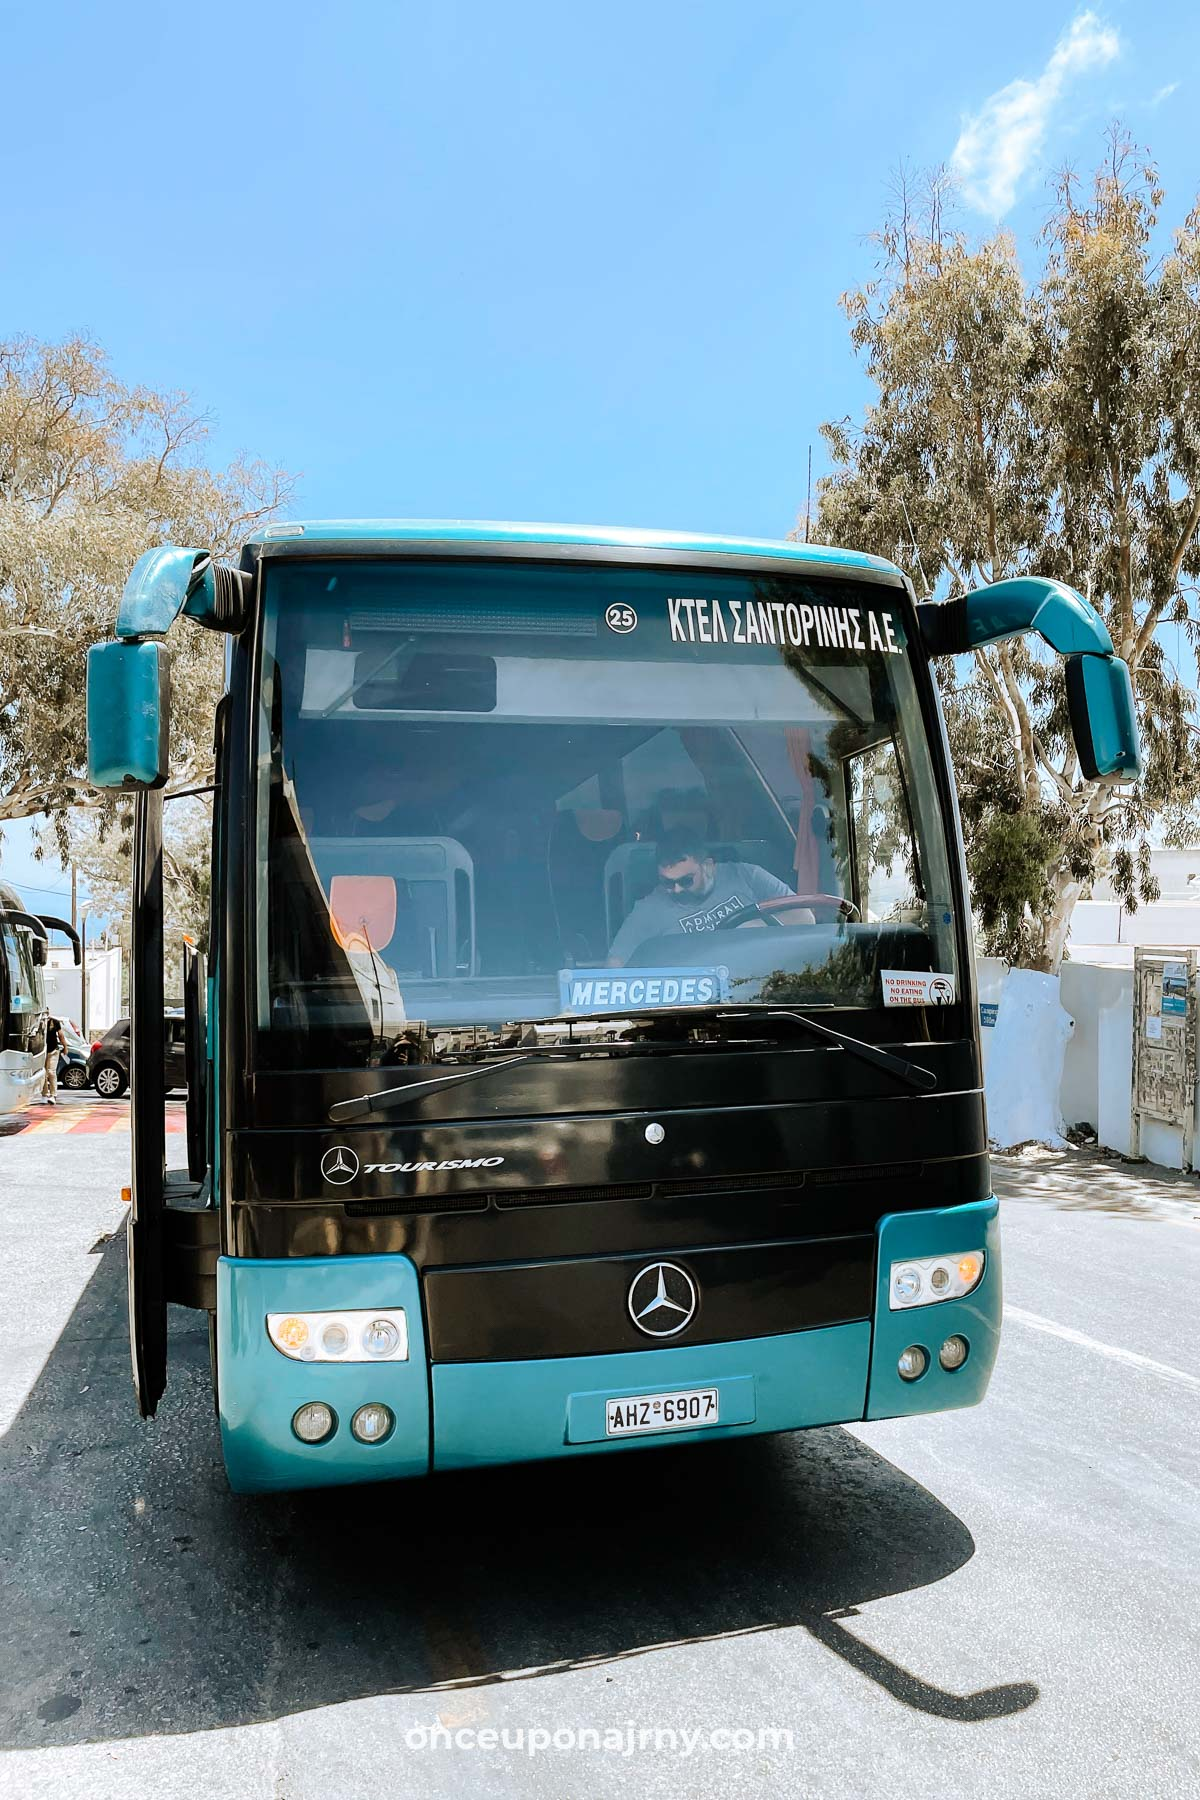 KTEL Bus Santorini Airport to Fira